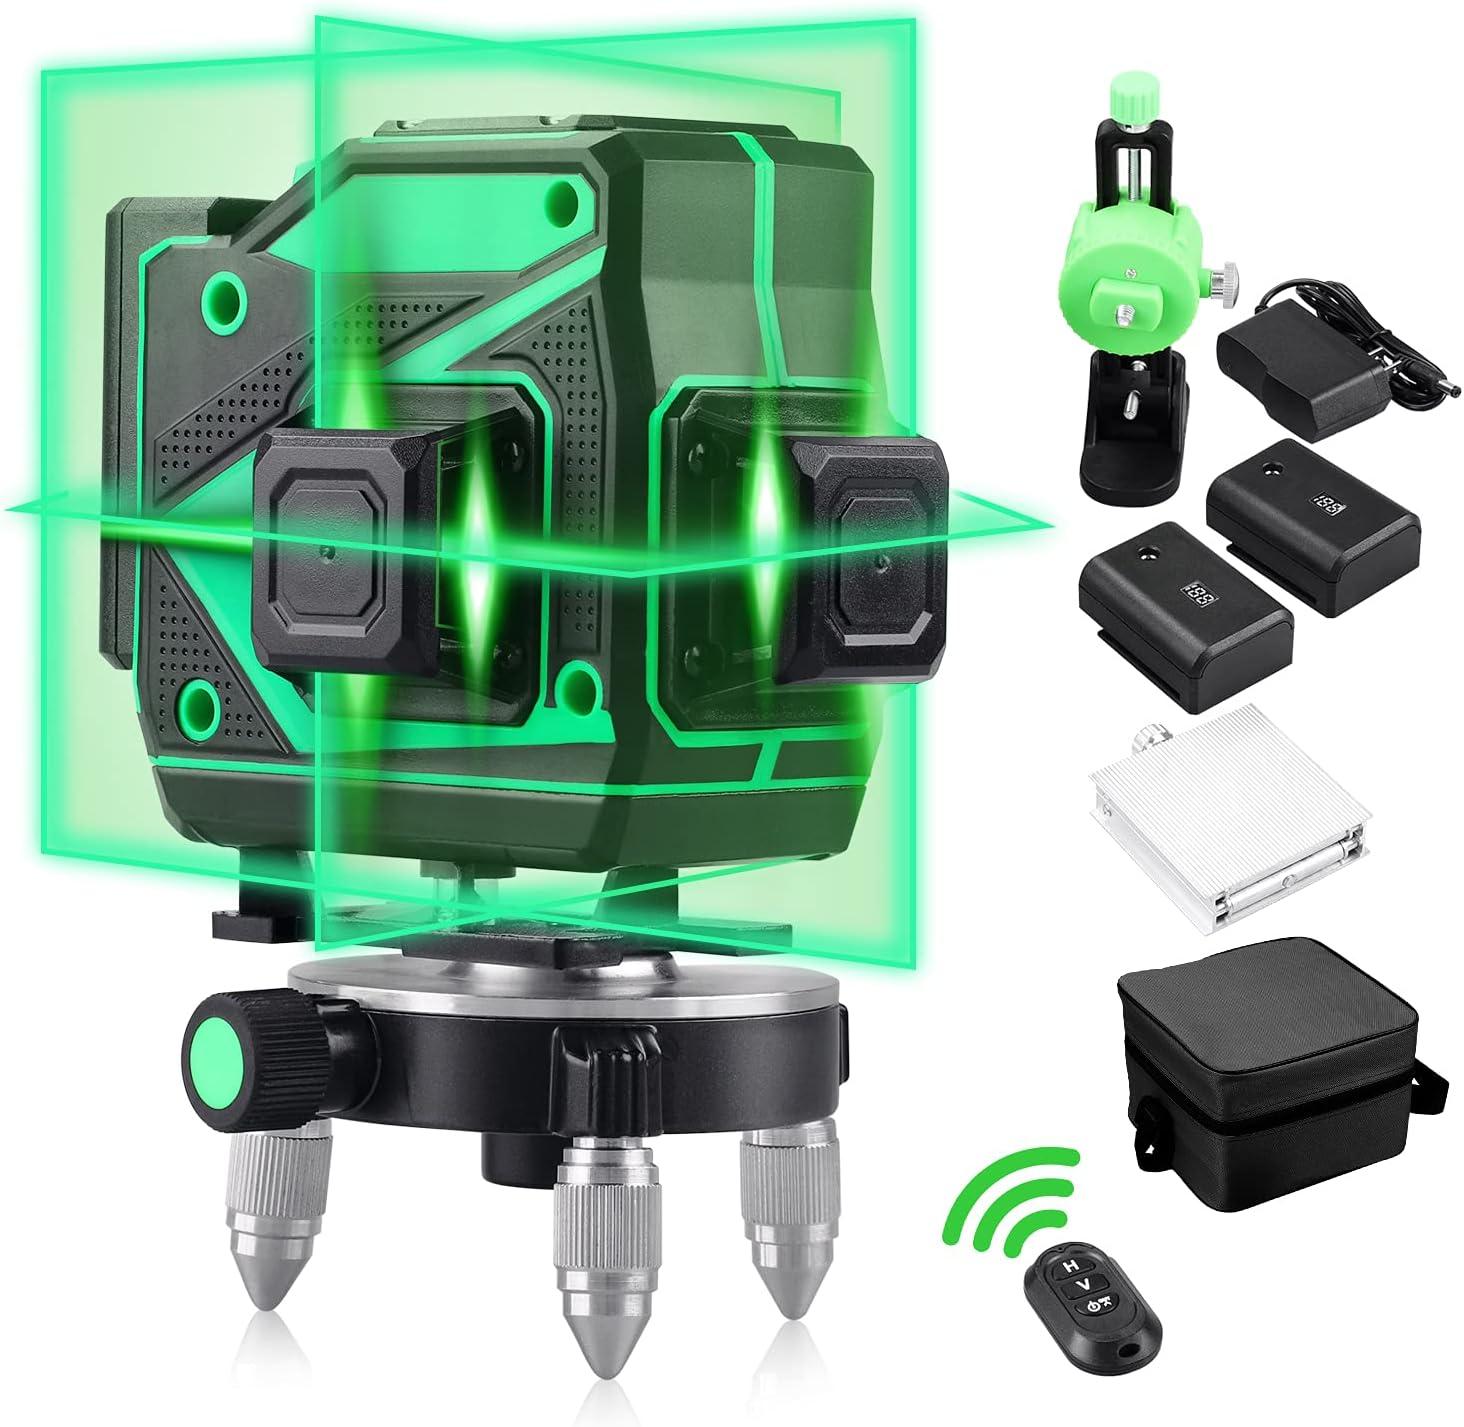 Nivel Laser Autonivelante Líneas Verde 45M 150 Ft Rotativo De 360 Rotacion Pisos